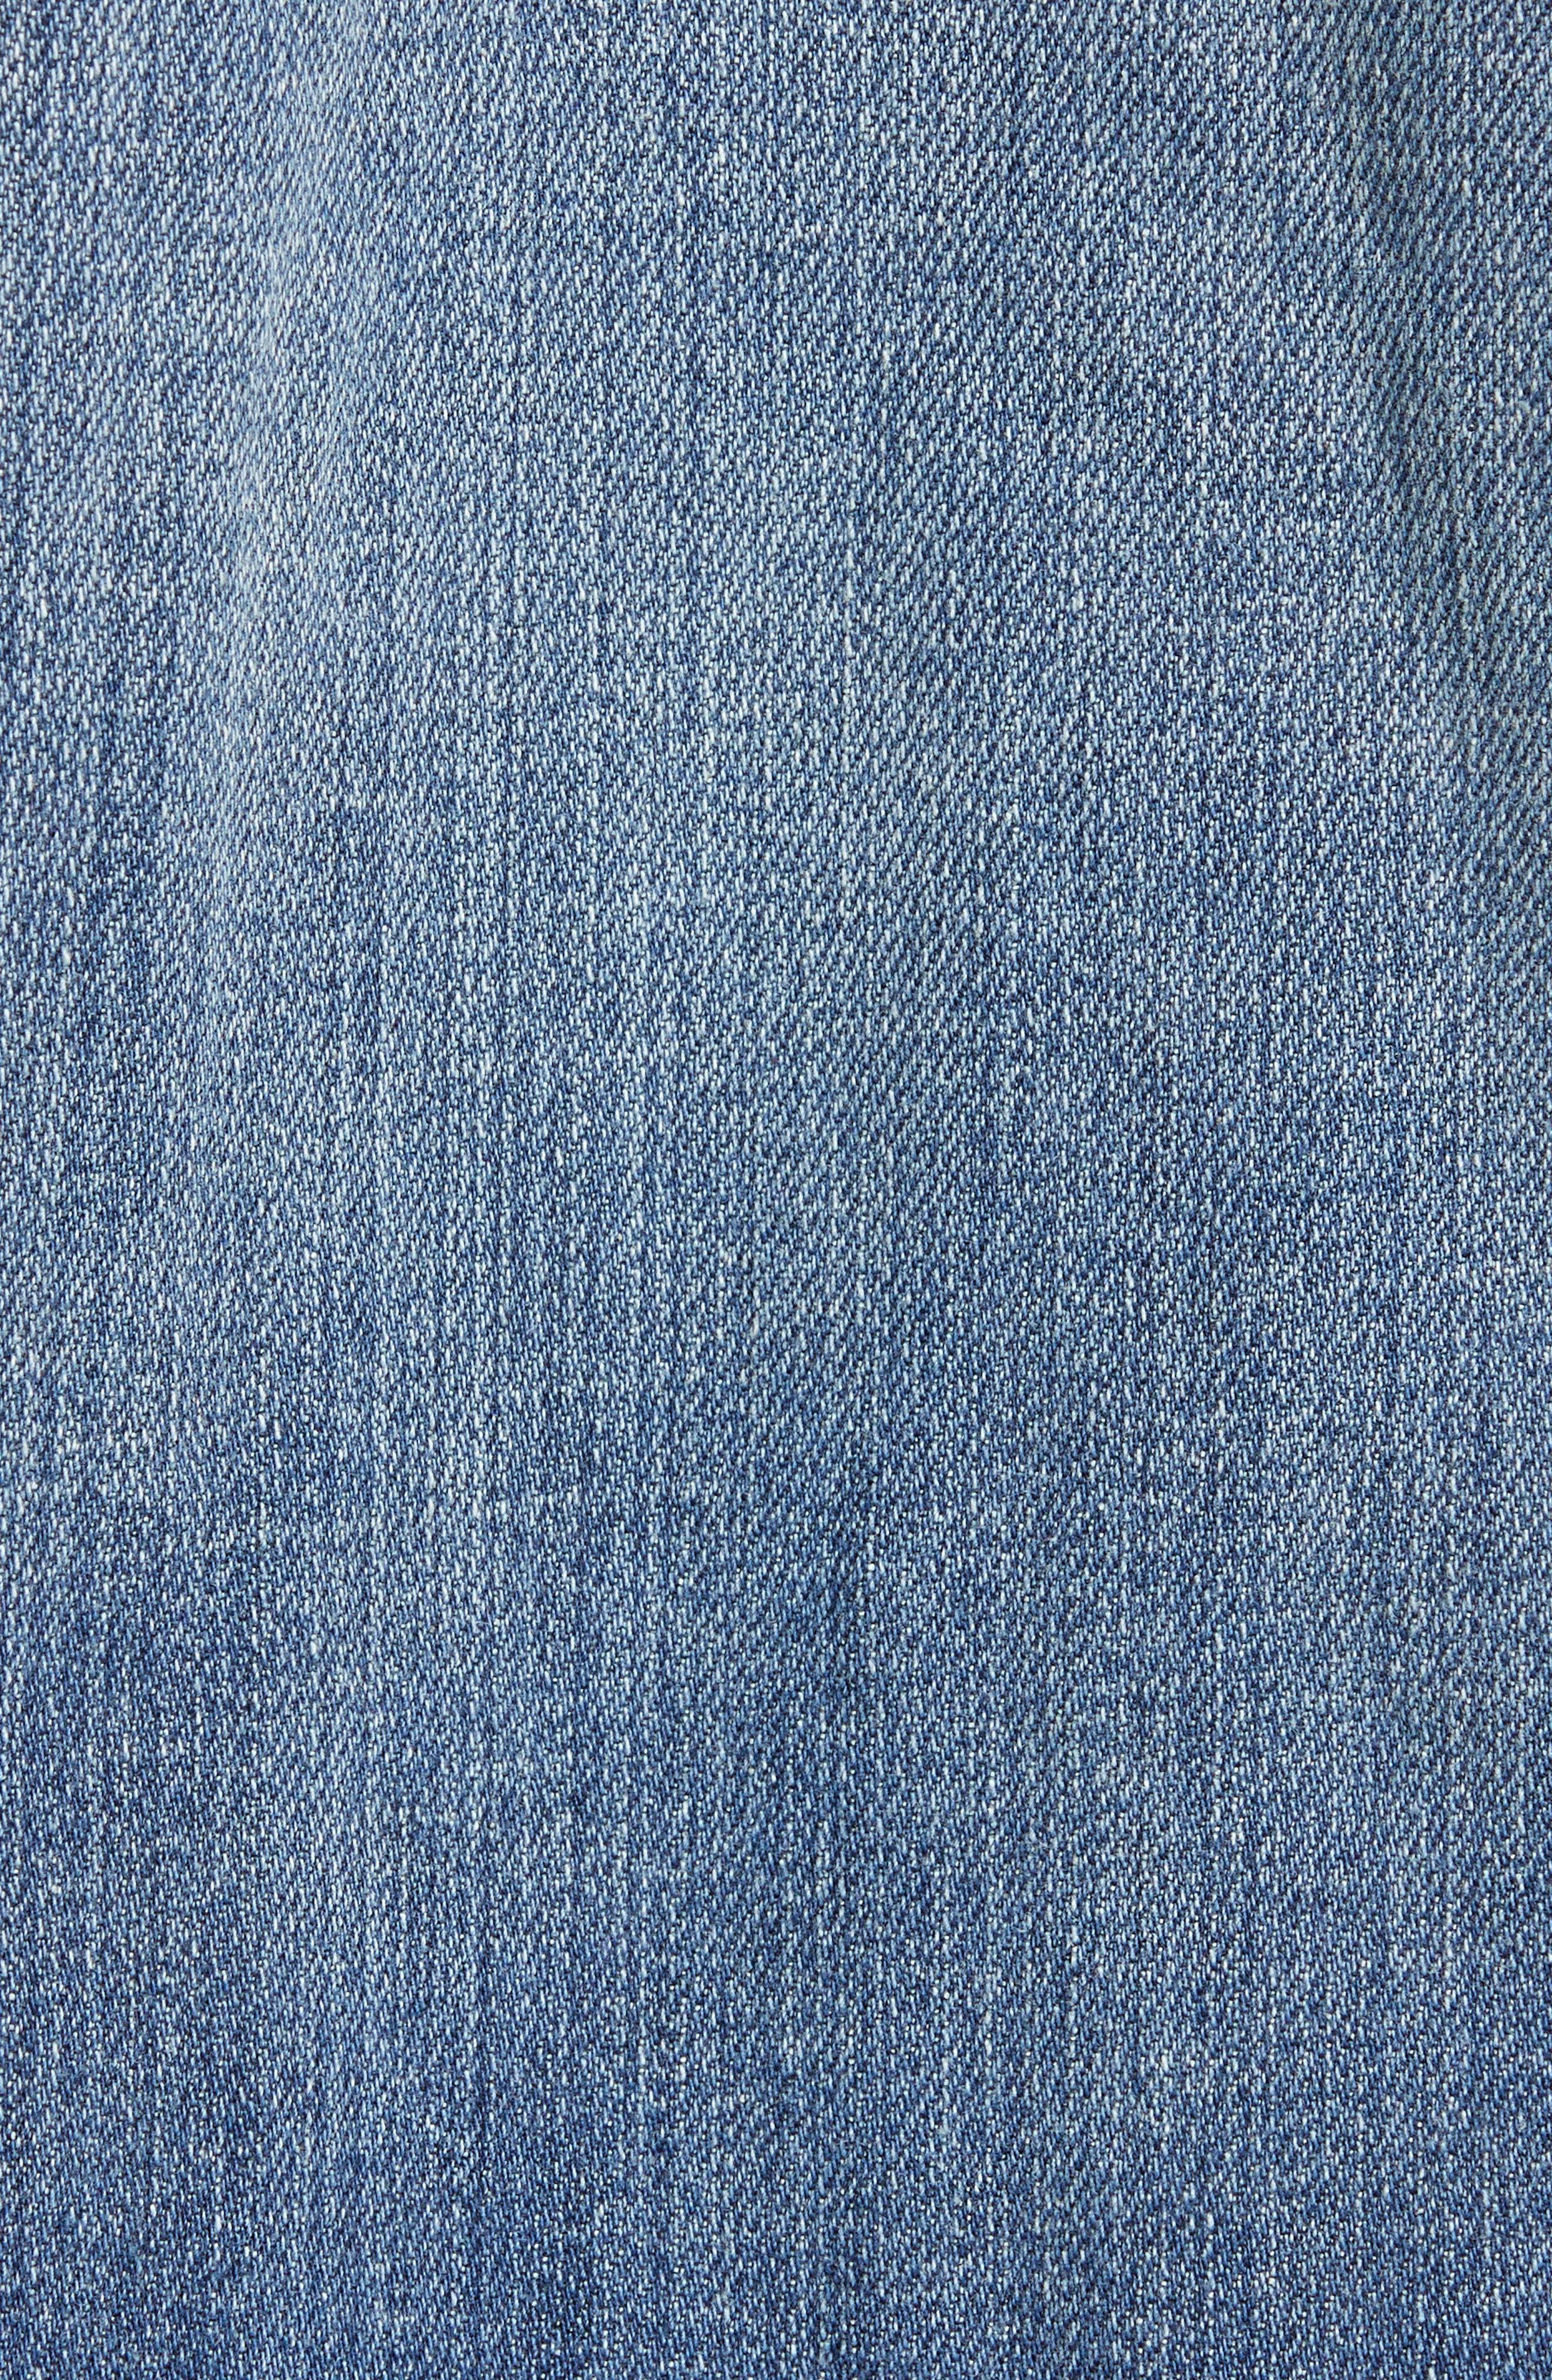 EILEEN FISHER, Oversize Stretch Organic Cotton Denim Jacket, Alternate thumbnail 7, color, AGED INDIGO